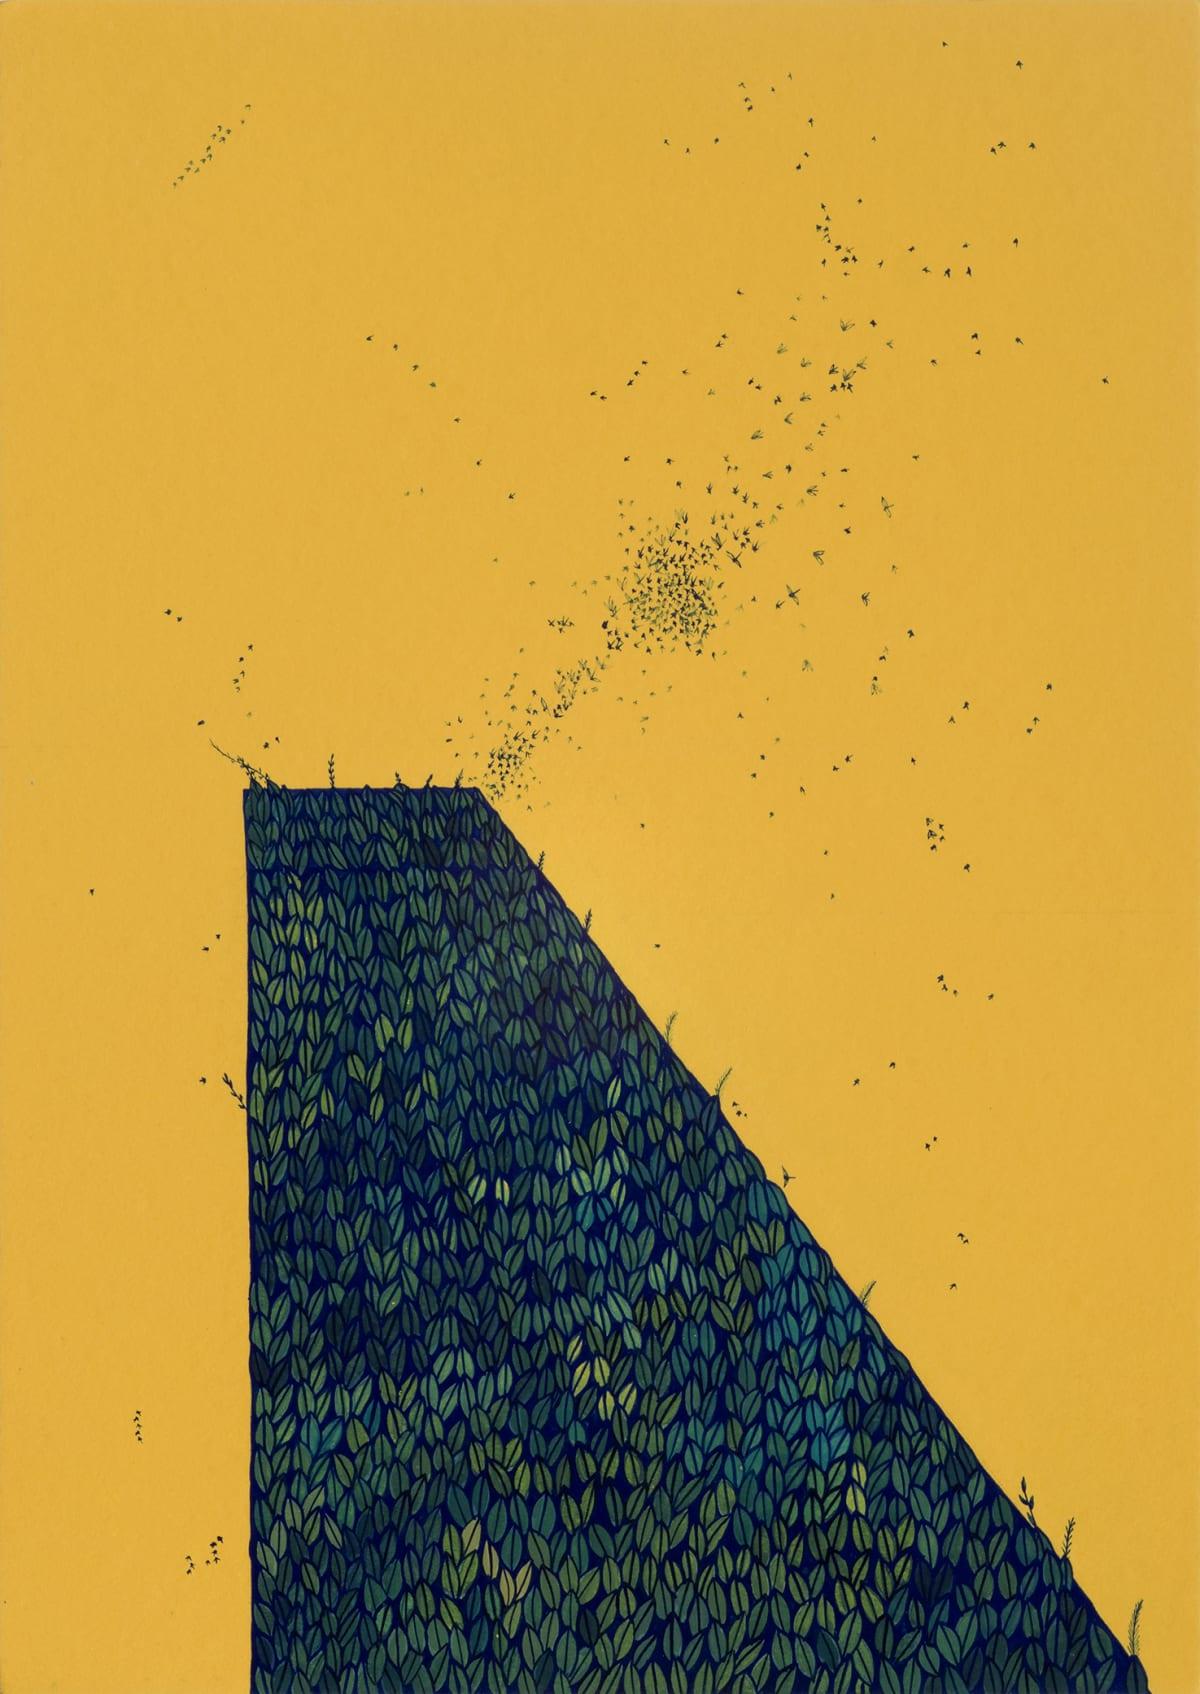 Wardha Shabbir Territory, 2020 Gouache on paper 29 x 25.6 cm 11 3/8 x 10 1/8 in